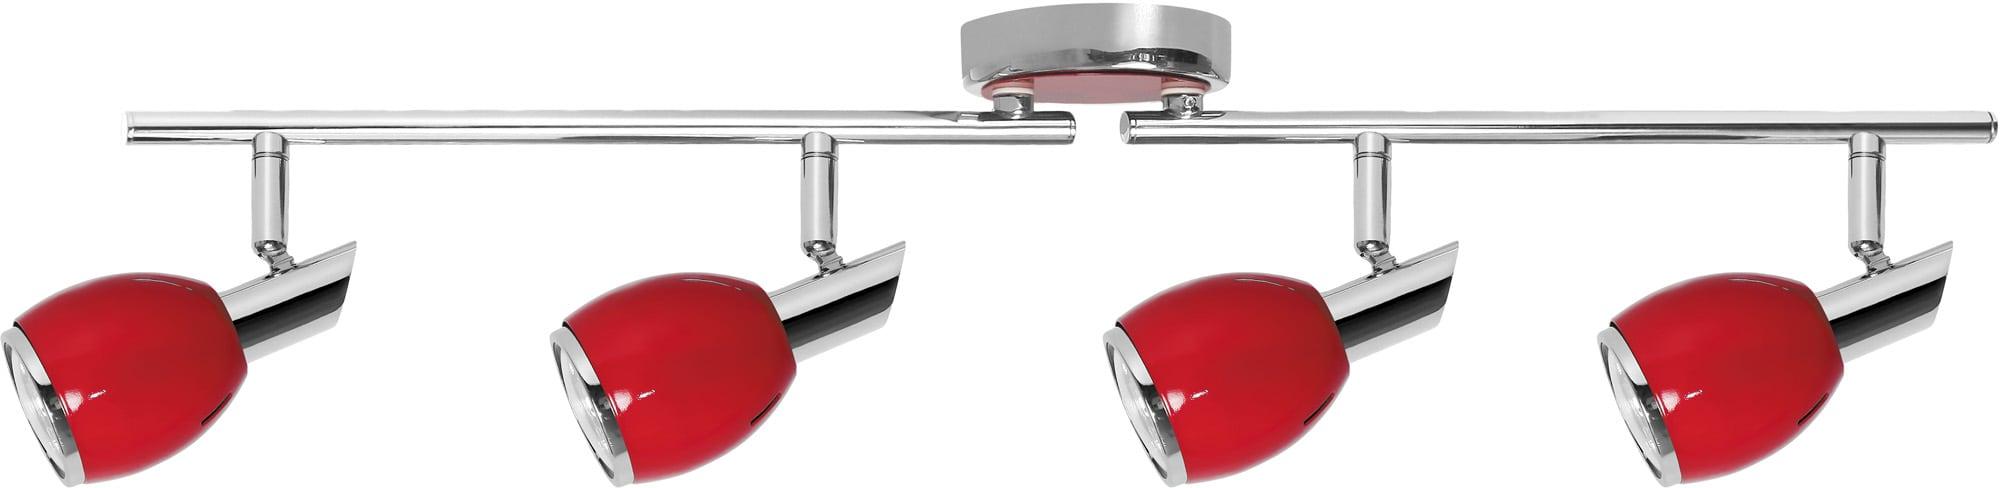 Spot Strip Red Colors Chrome GU10